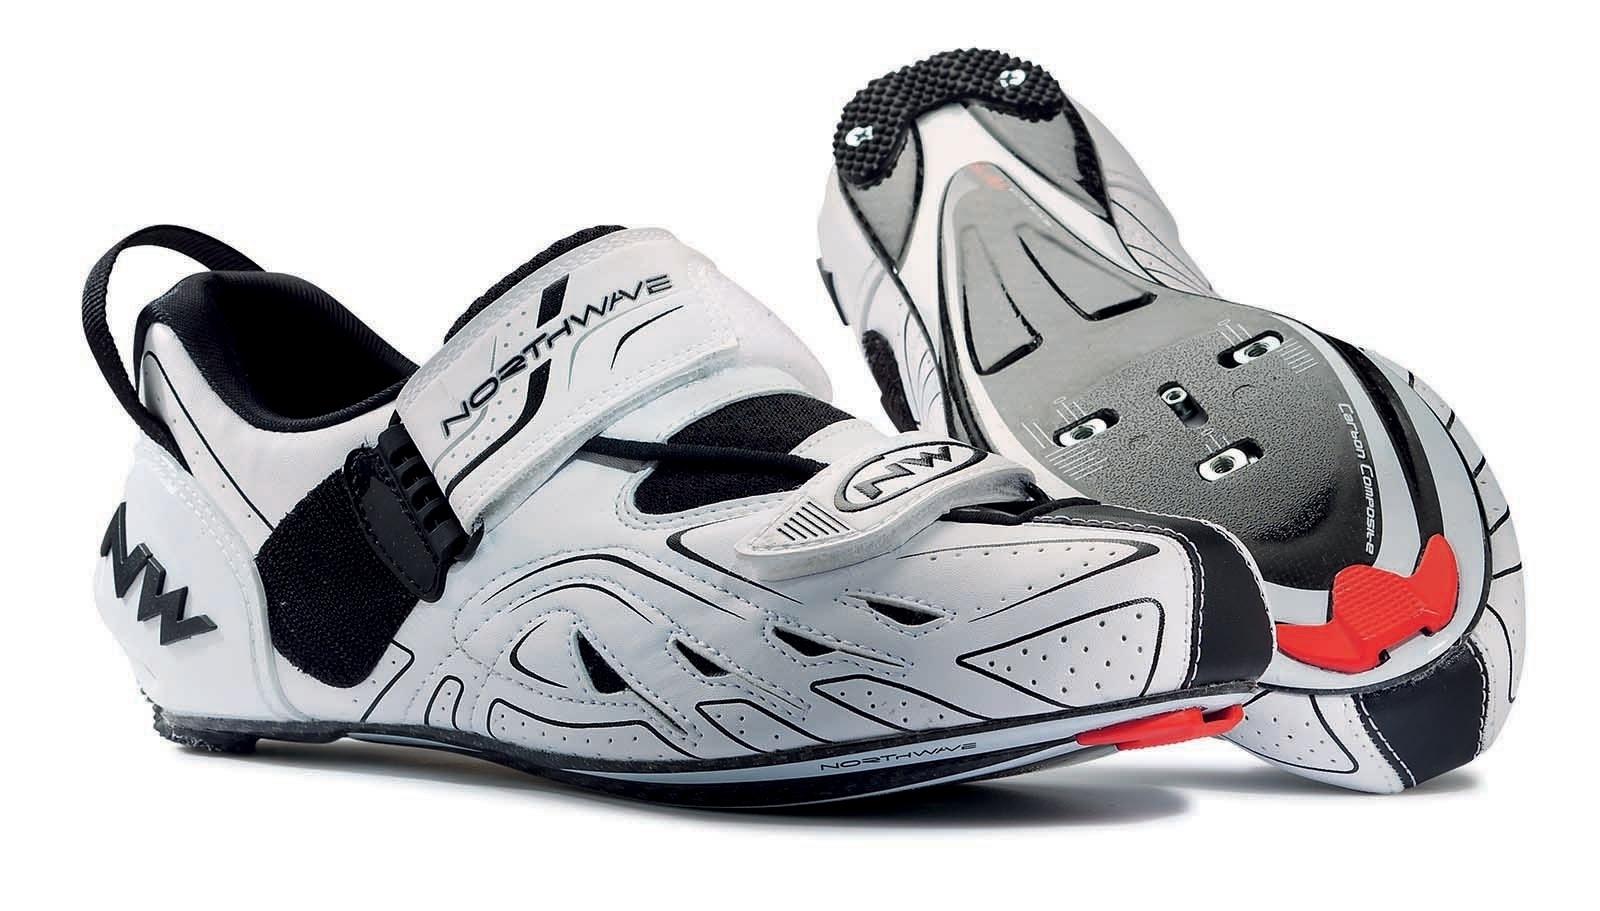 Best price Northwave Man triathlon shoes TRIBUTE